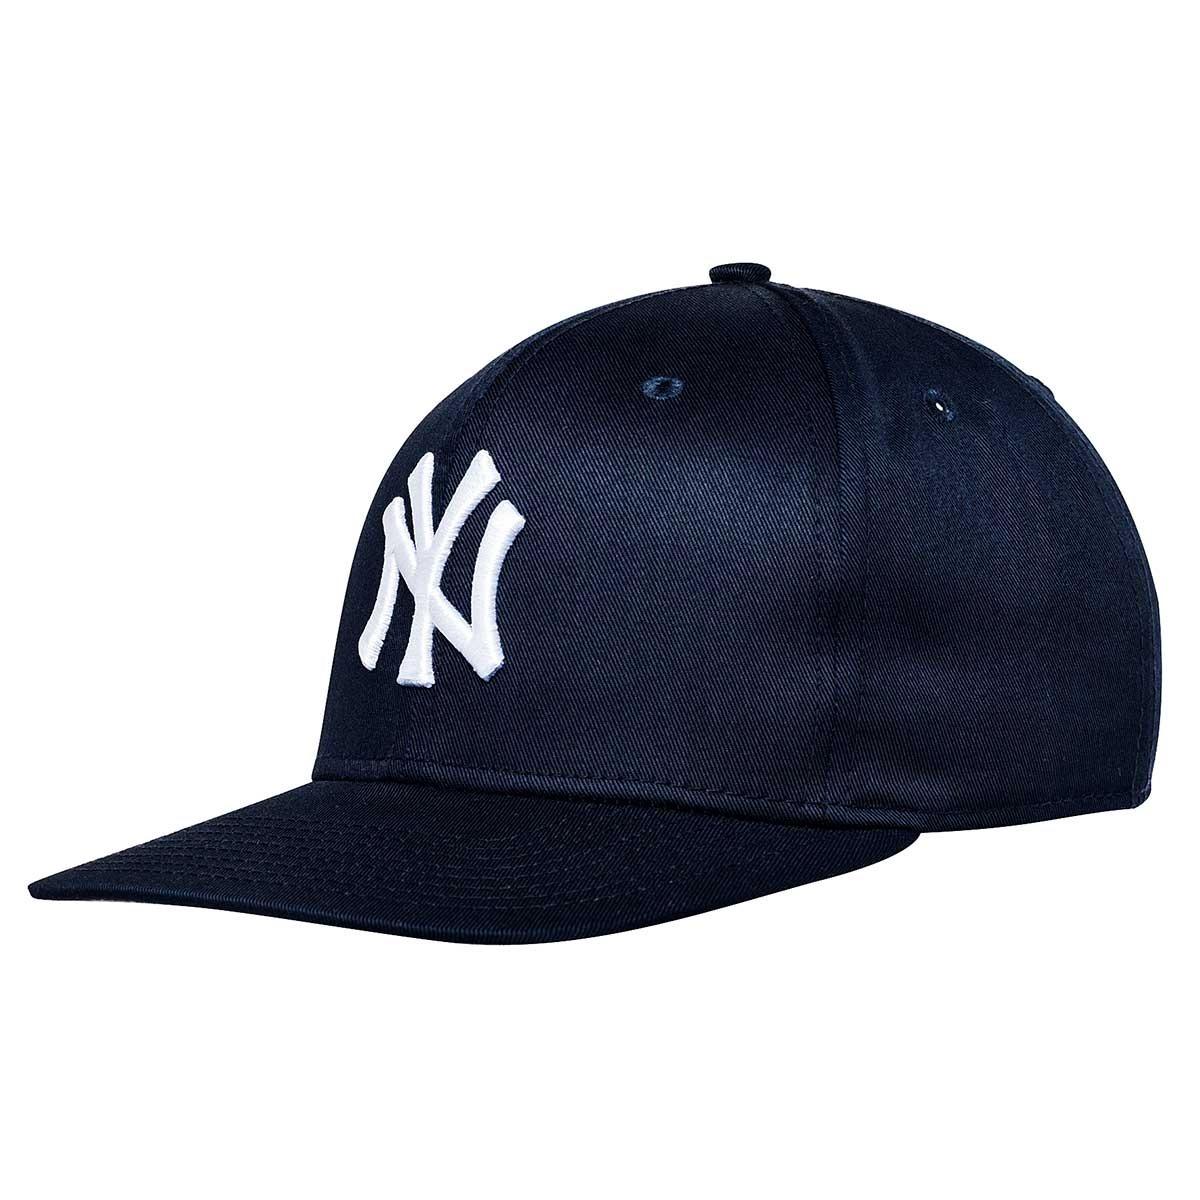 78e1ce965110 Gorra Para Caballero New Era Yankees Original 11353337 Dgt